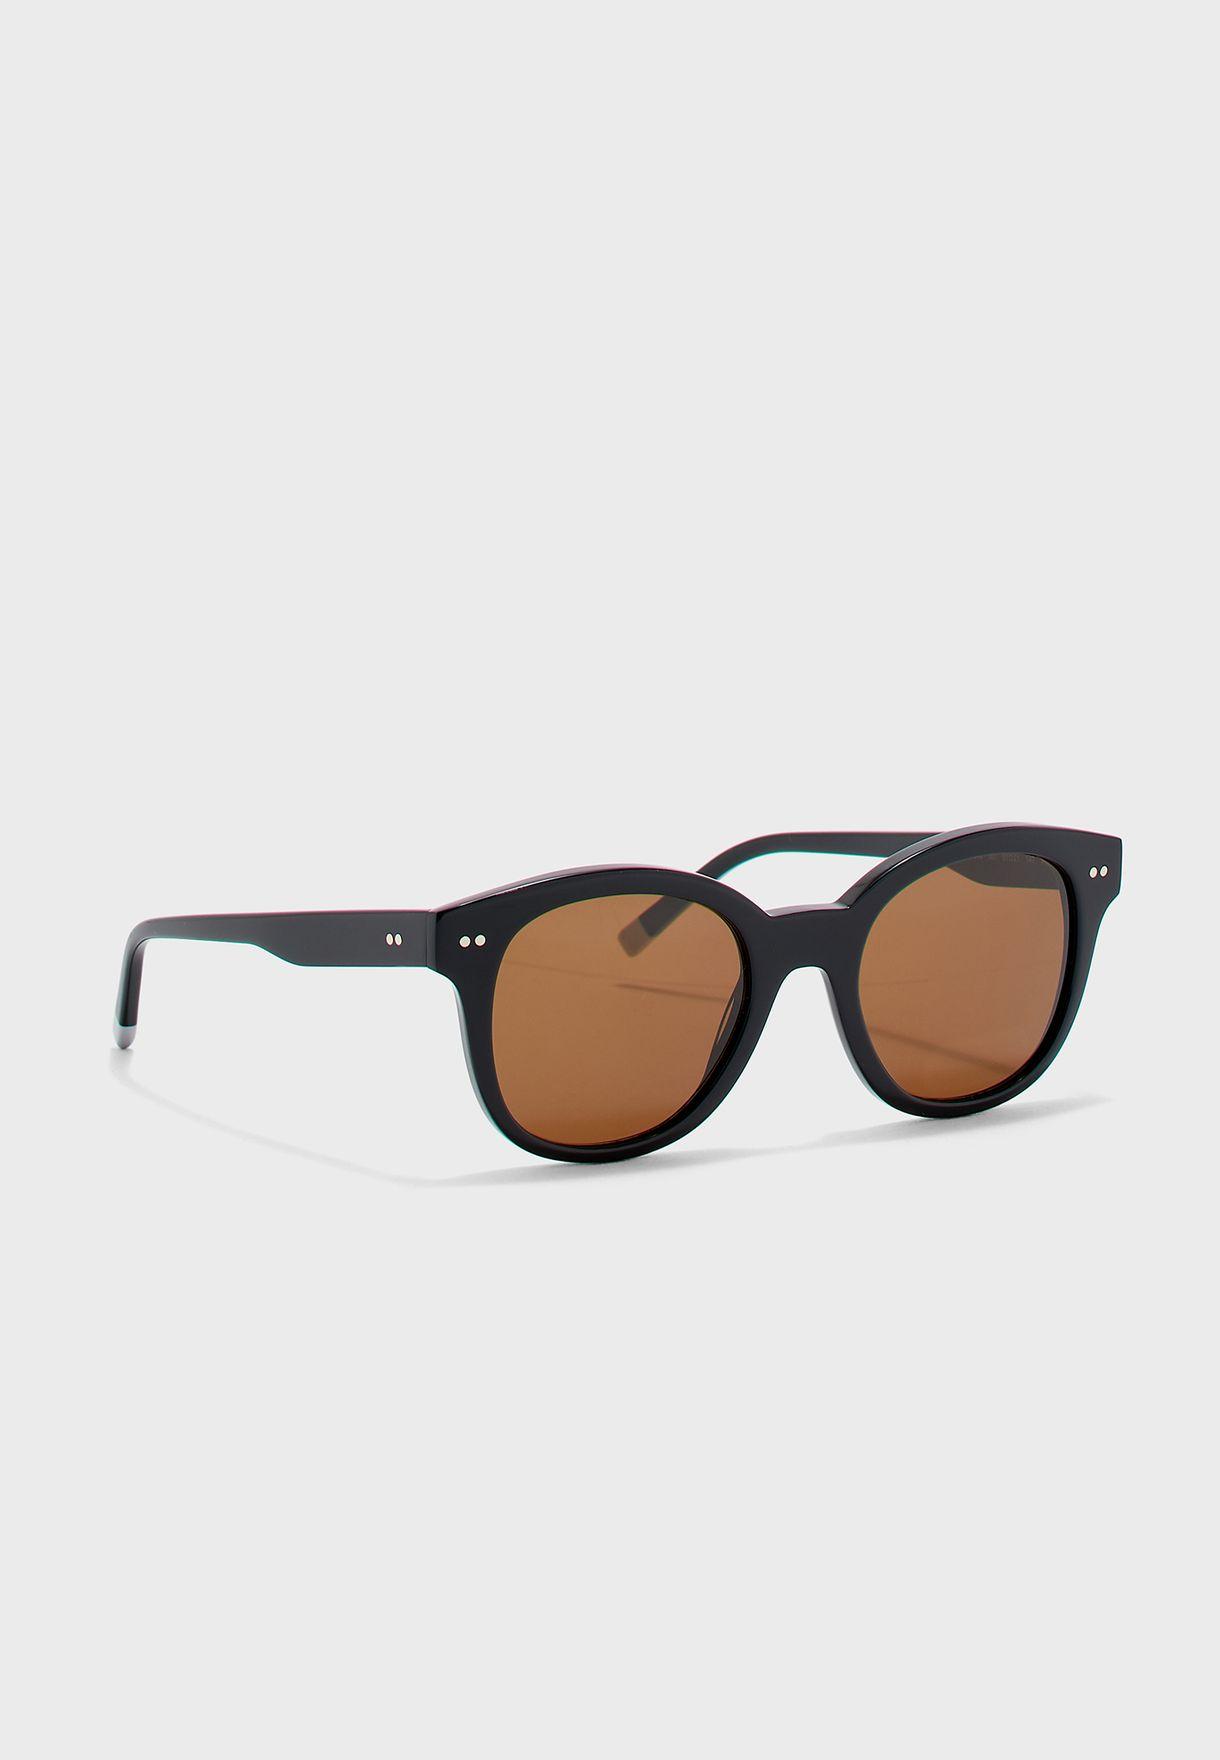 CK4354S Cateye Sunglasses